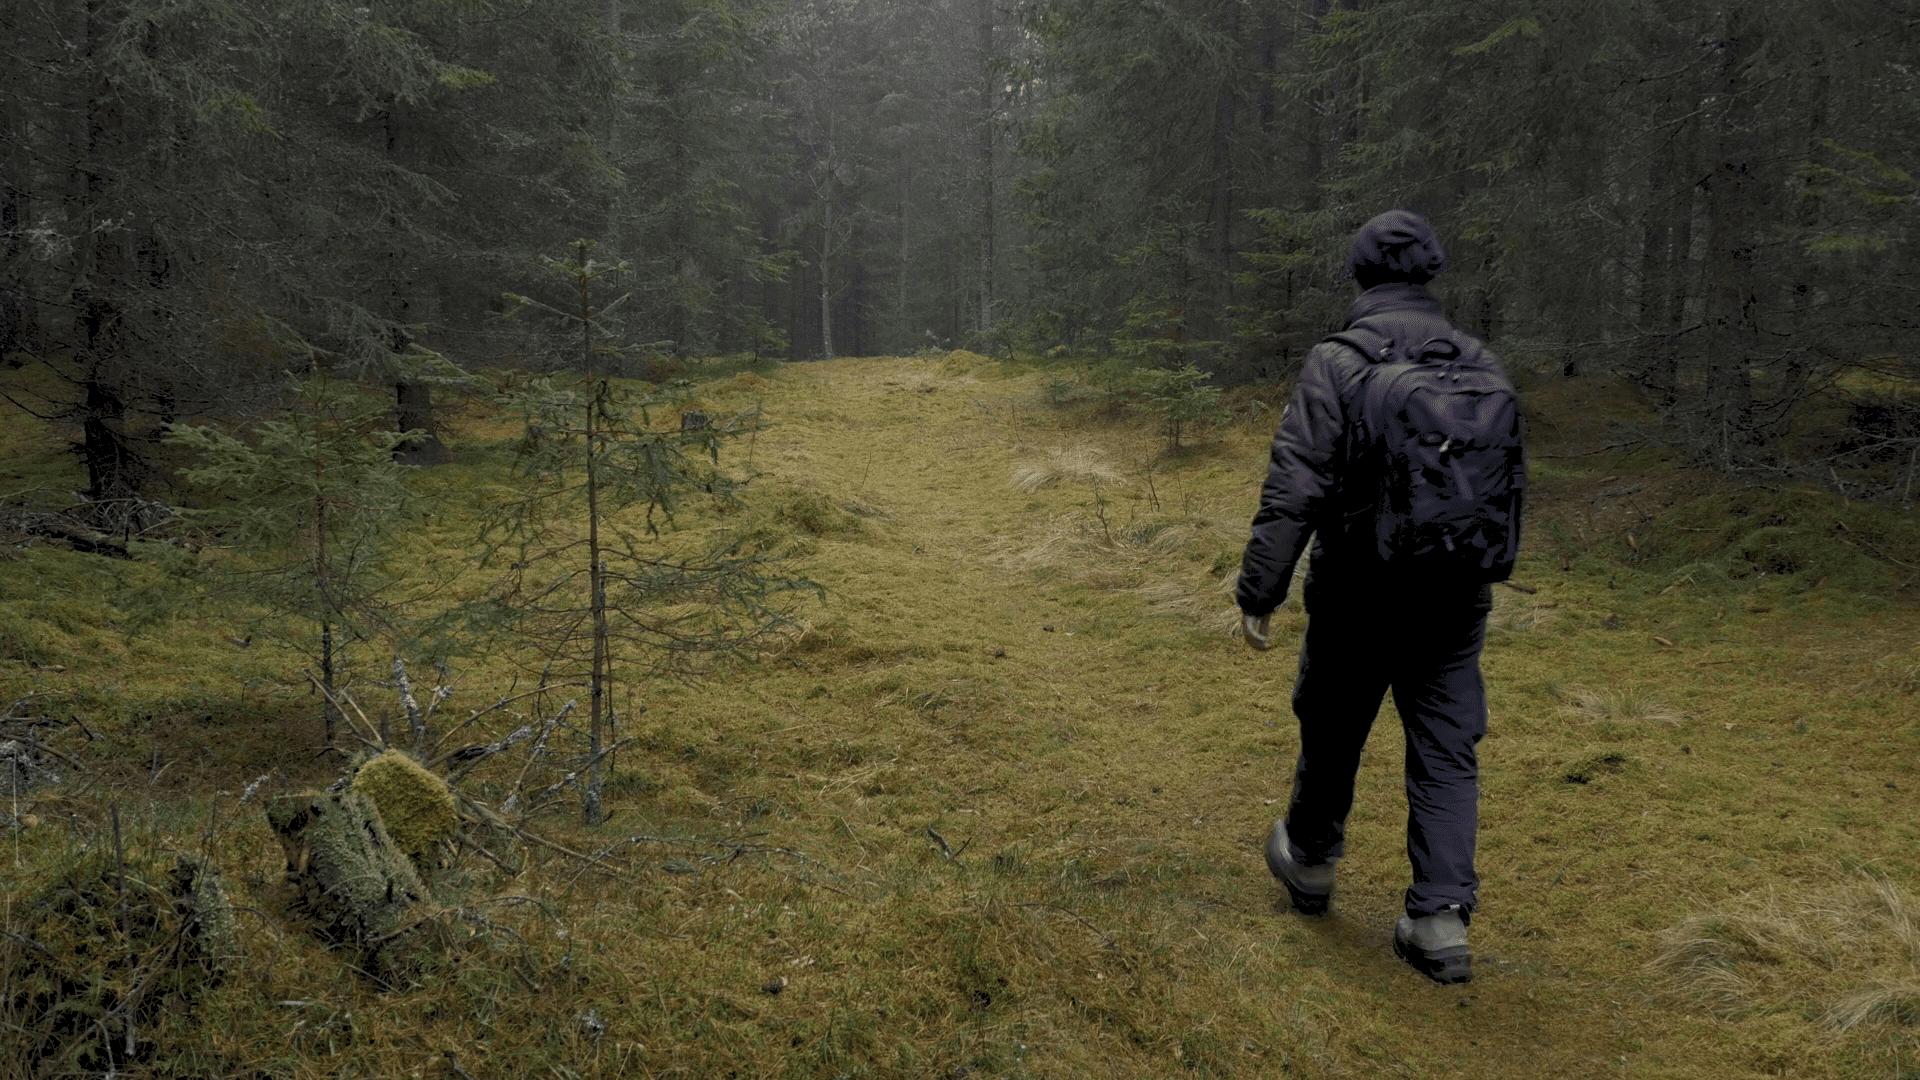 videoblocks-man-walking-through-a-dark-forest_sdzdloshe_thumbnail-full11